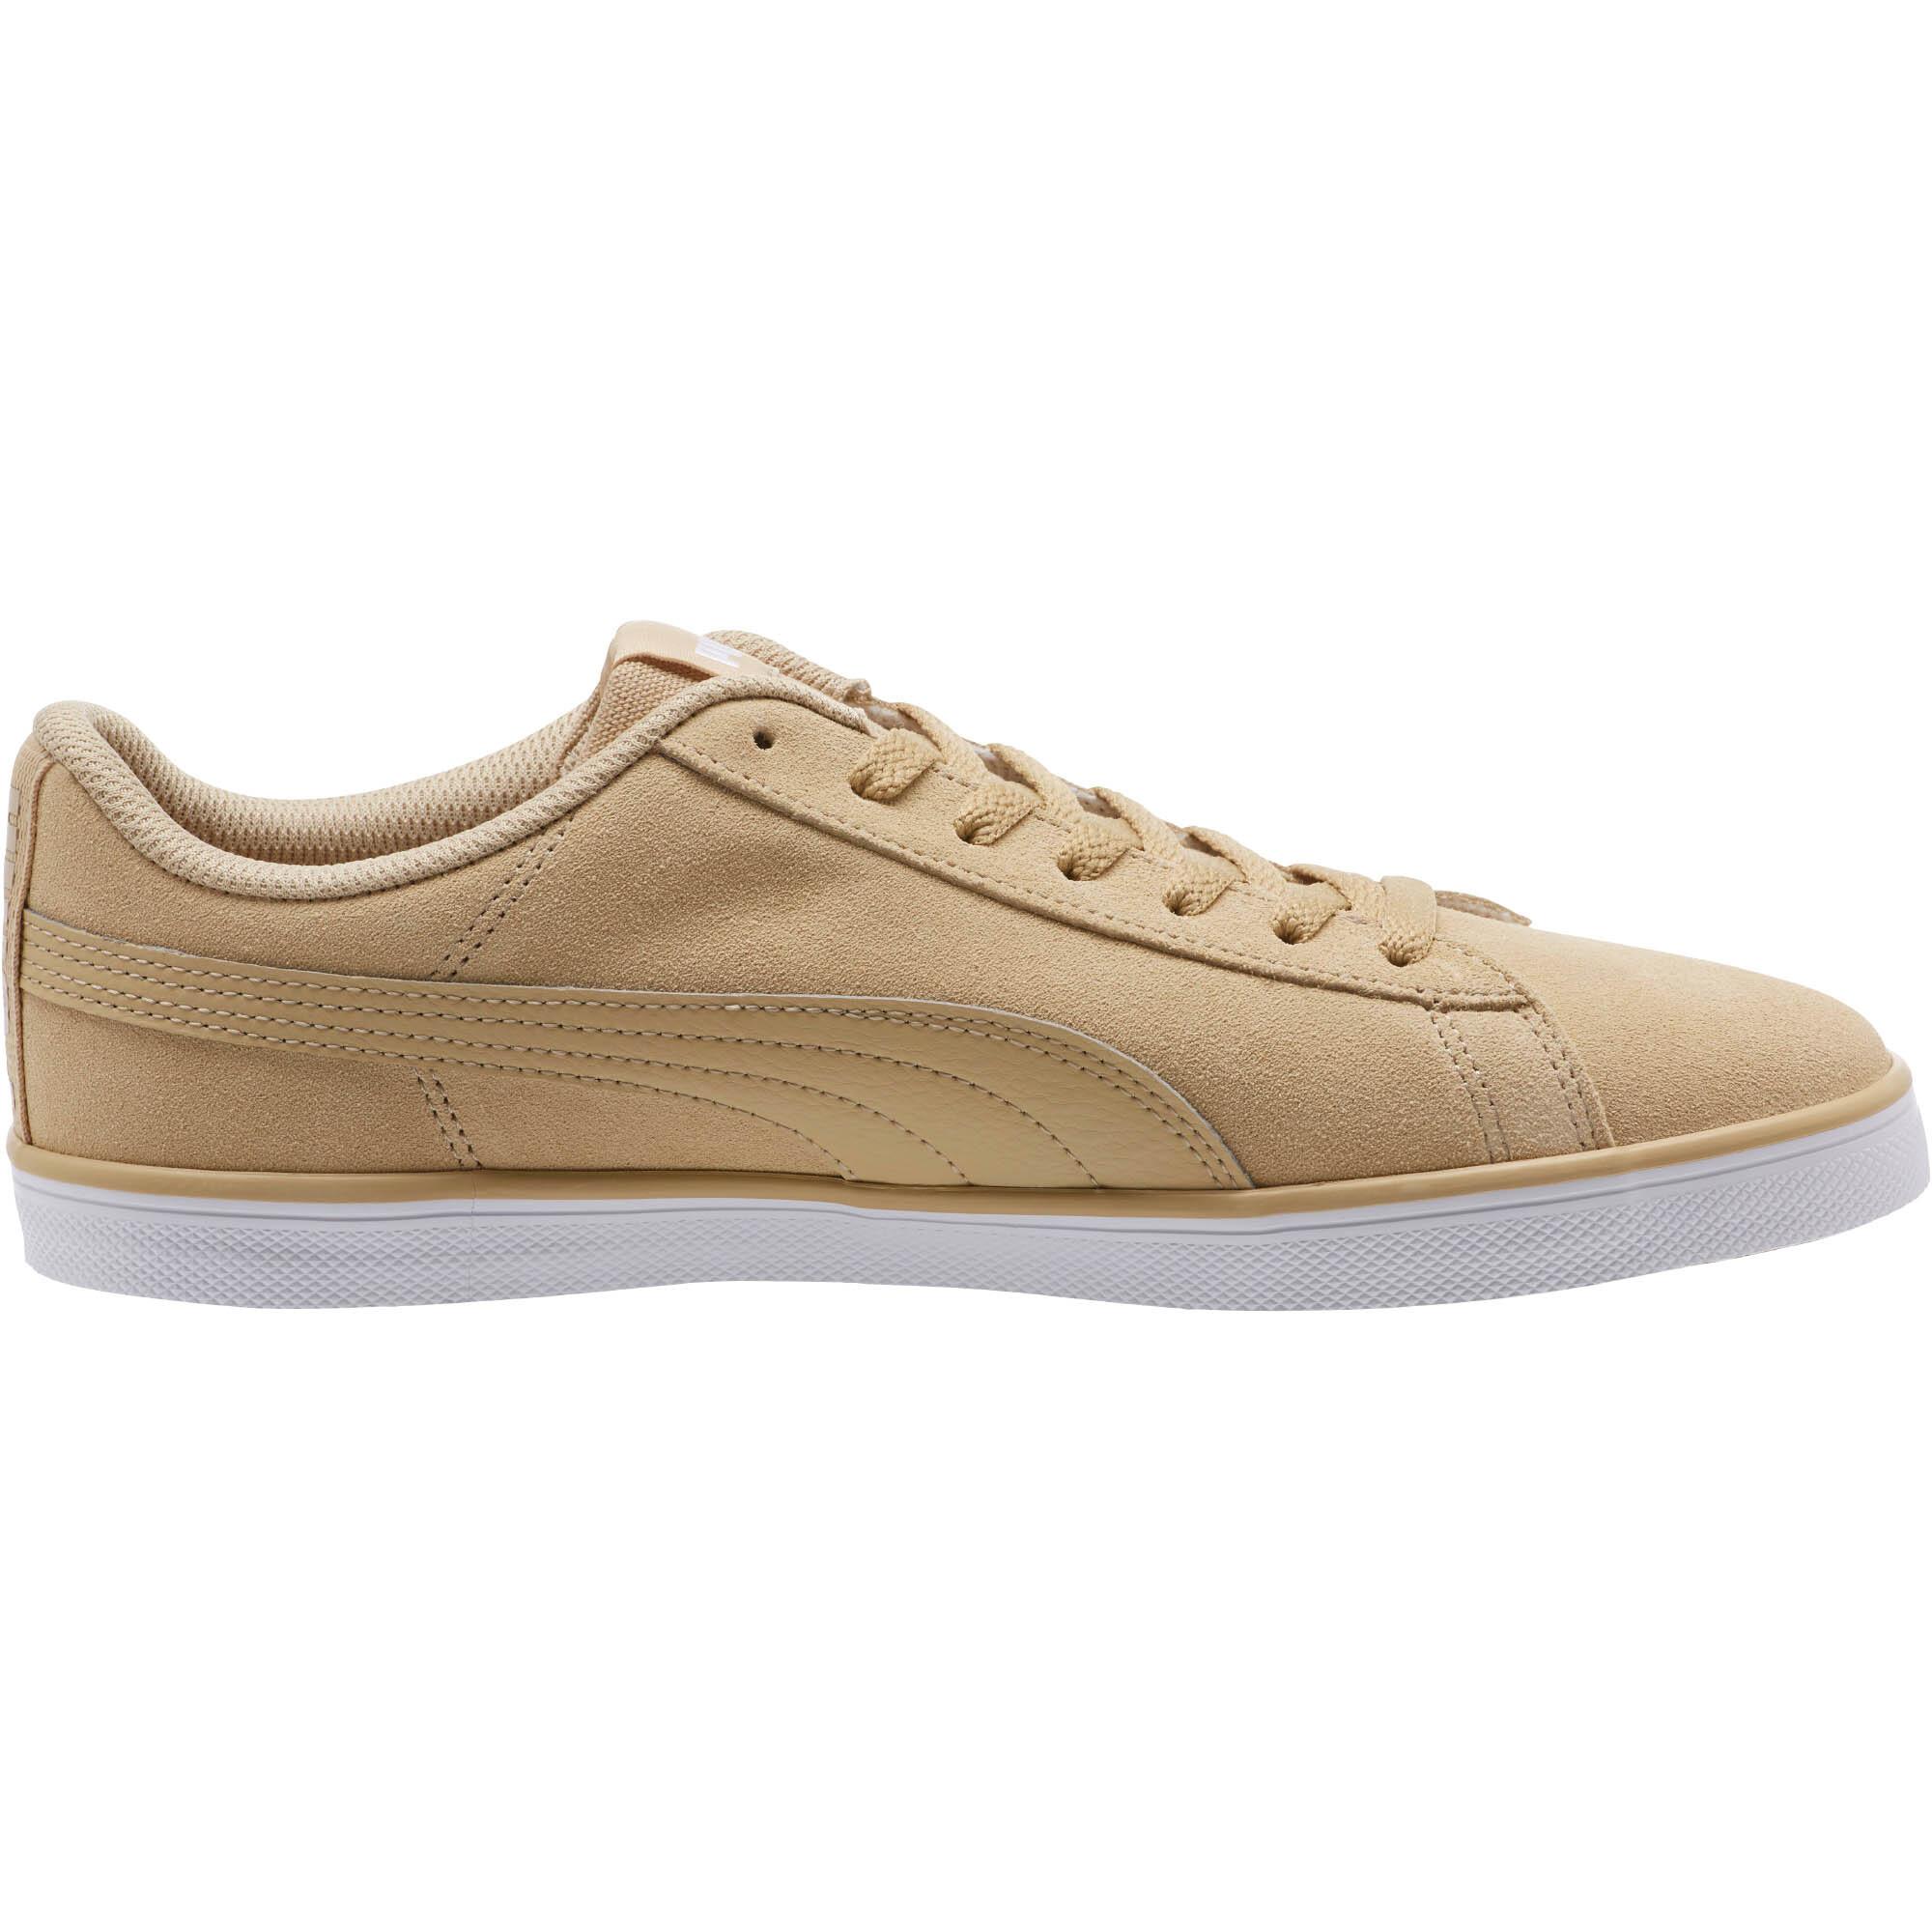 PUMA-Urban-Plus-Suede-Sneakers-Men-Shoe-Basics thumbnail 27